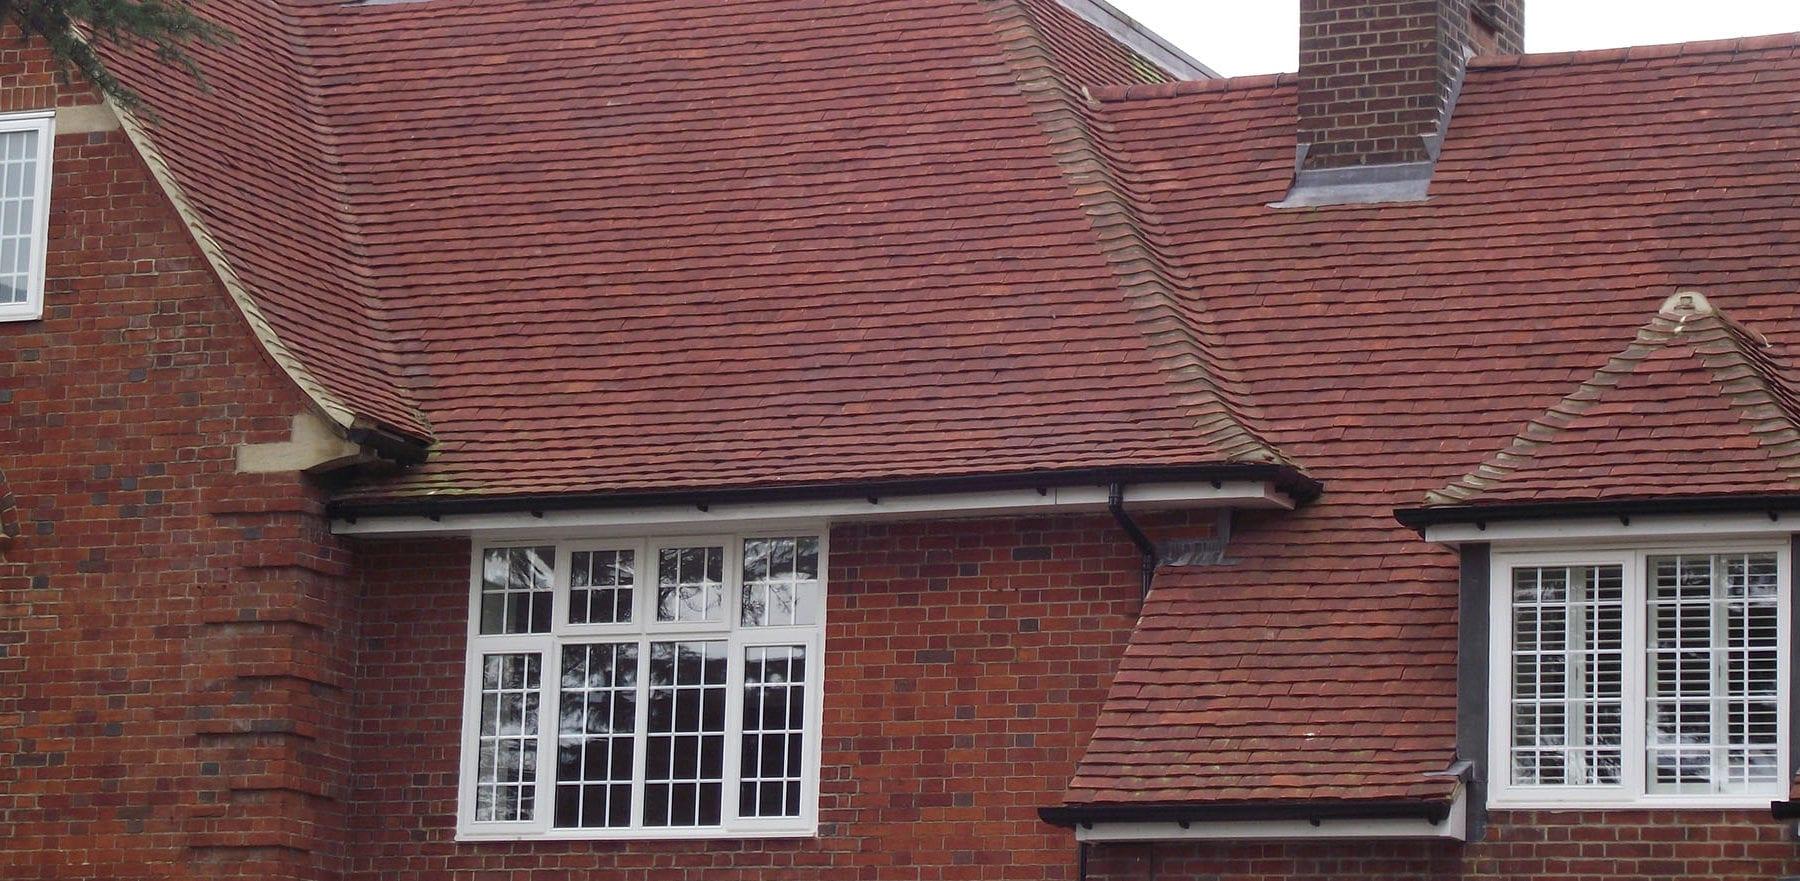 Lifestiles - Handmade Heather Clay Roof Tiles - Bickley, England 6